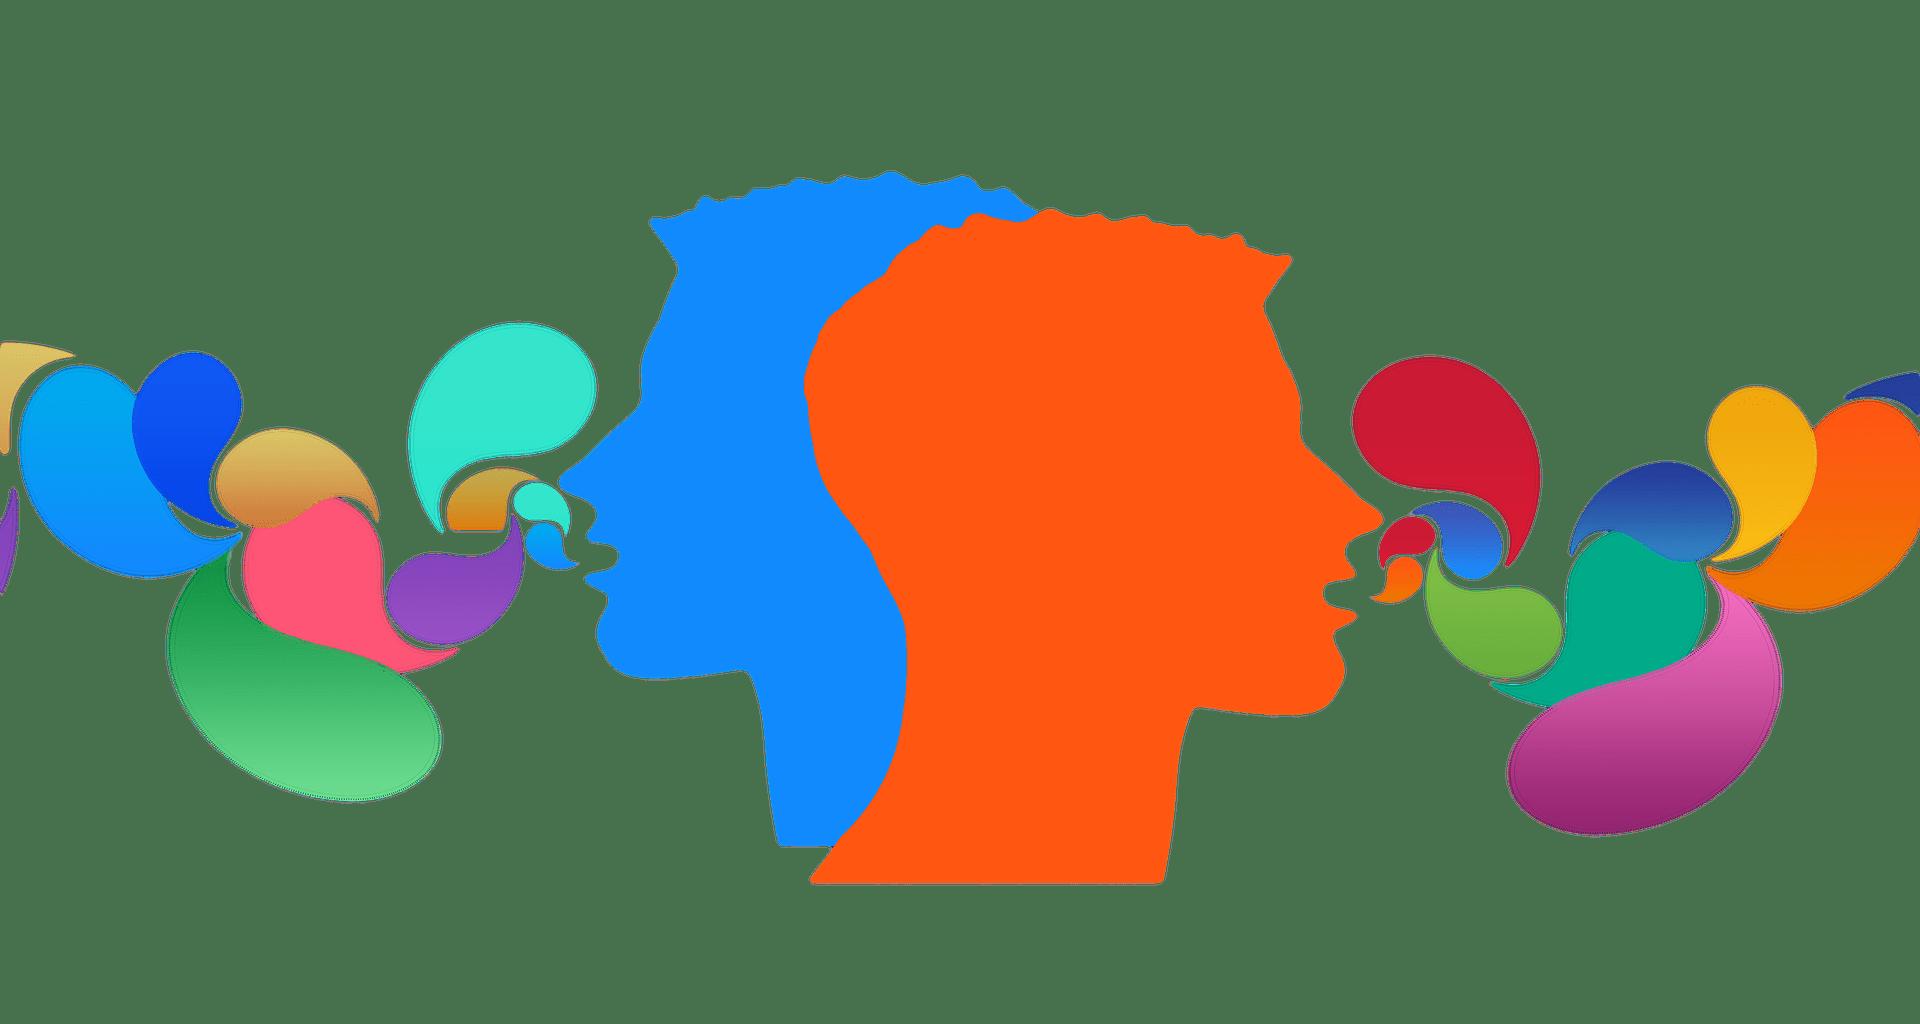 Improving Your Communication